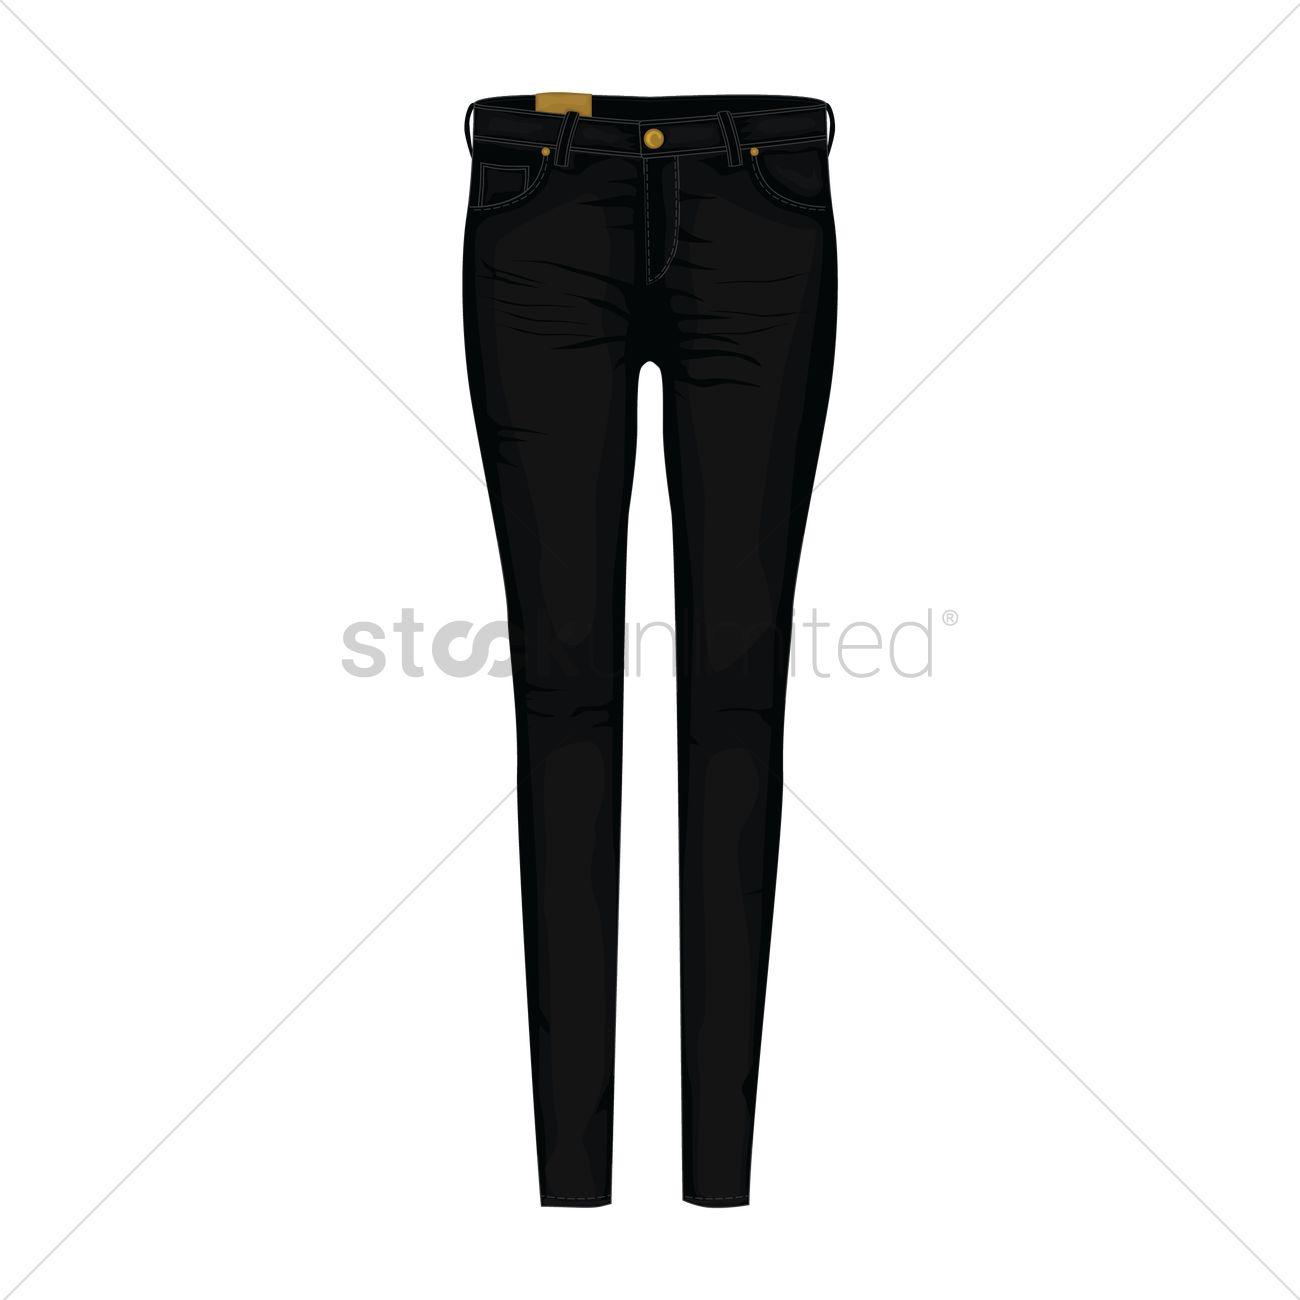 1300x1300 Black Jeans Vector Image